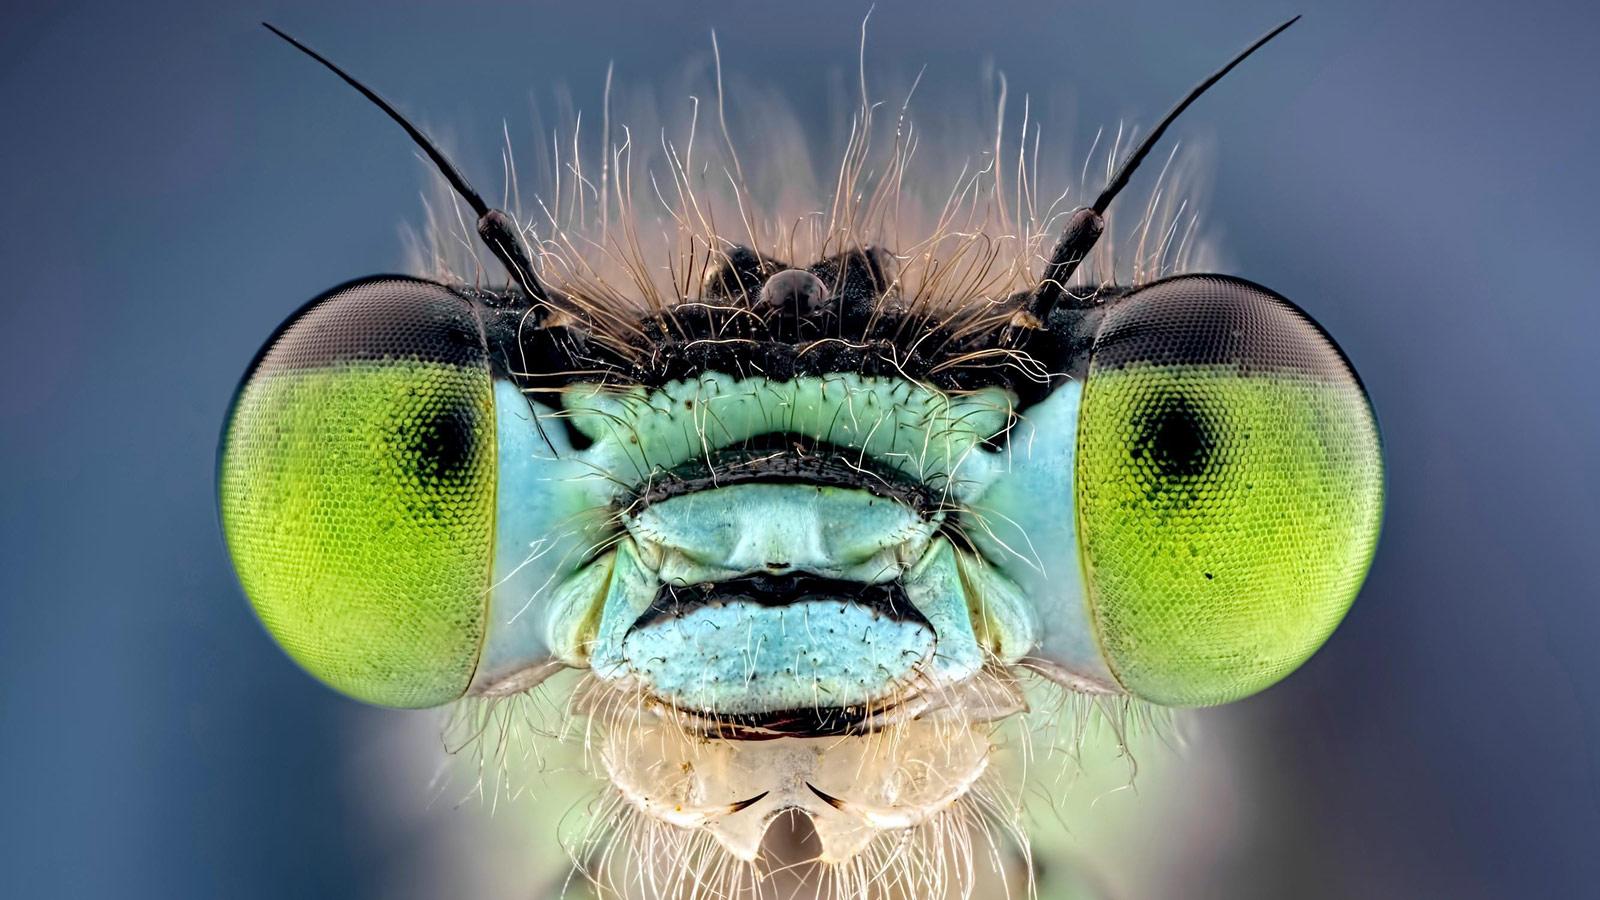 Bud Eyed, © Keith, Wildlife Category Expert Winner, CEPIC Stock Photography Awards